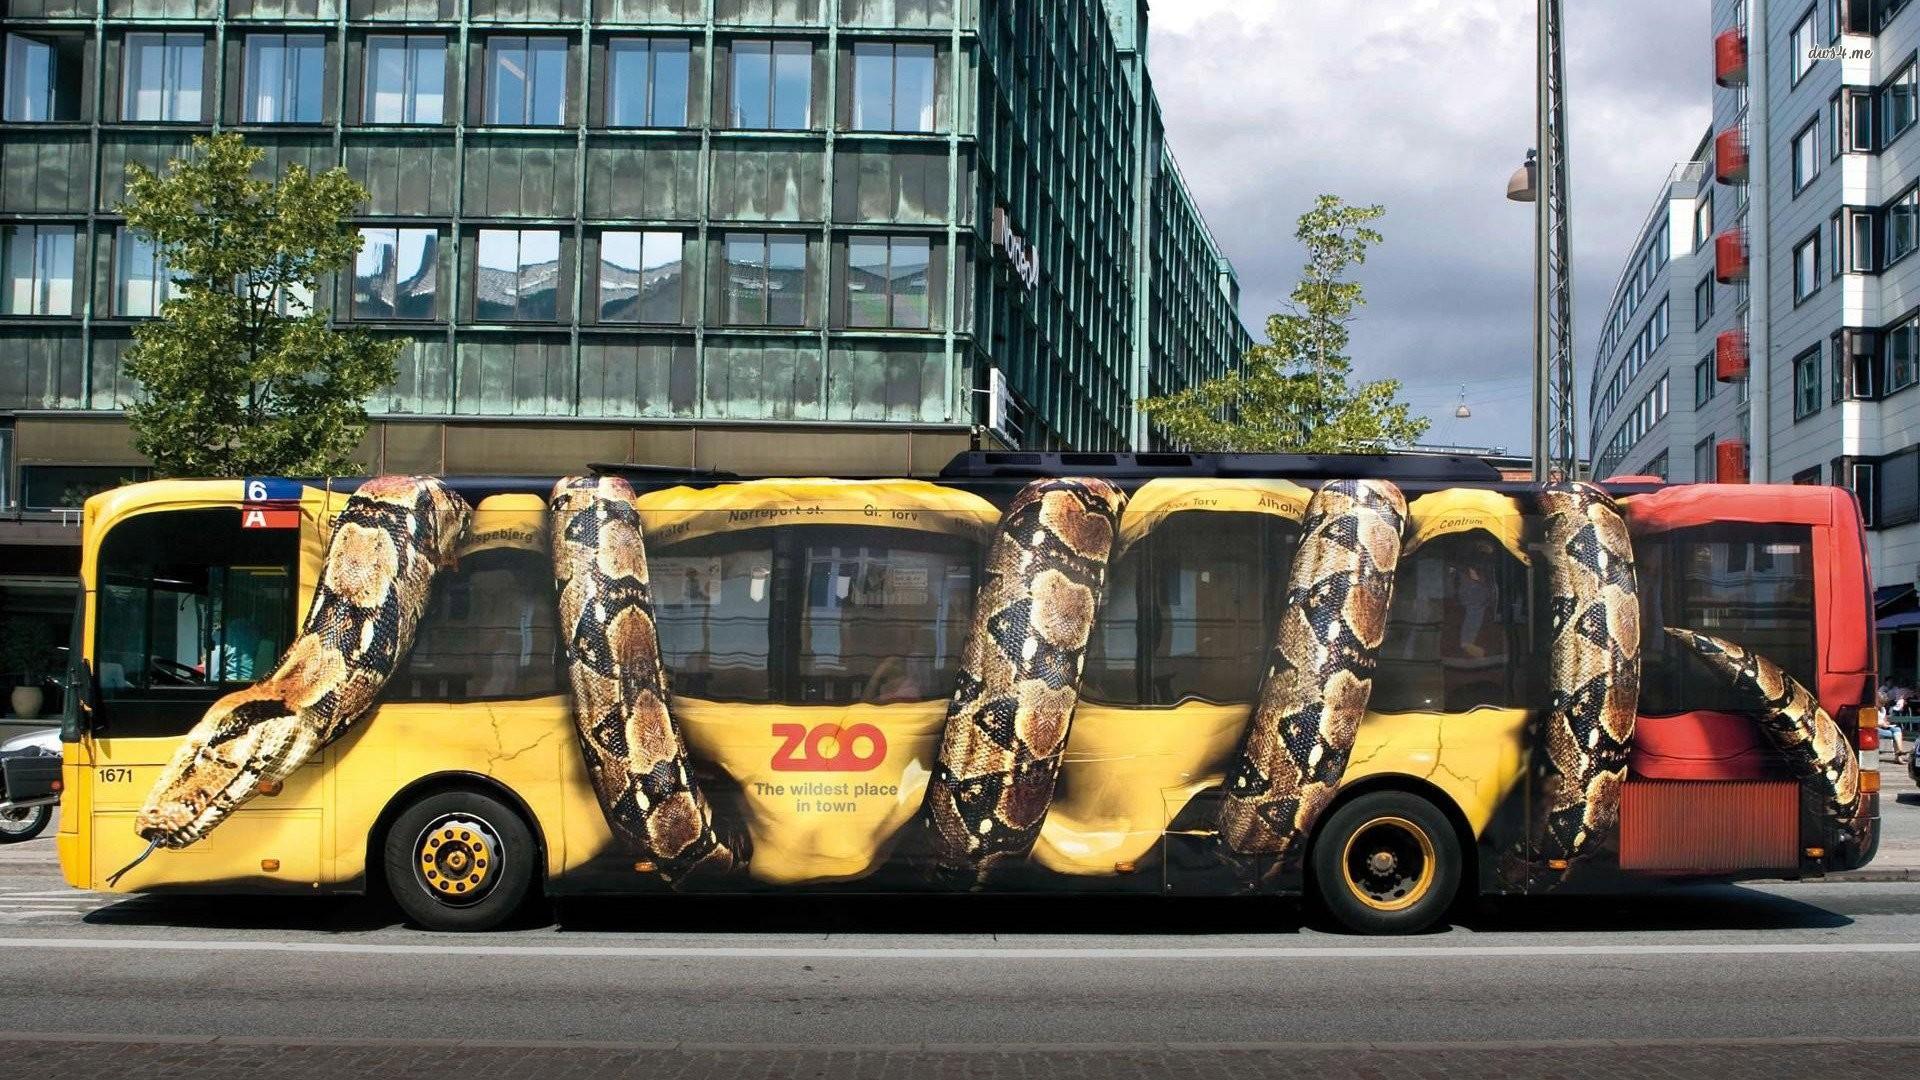 … wallpapers 23877; copenhagen zoo advert snake bus walldevil …